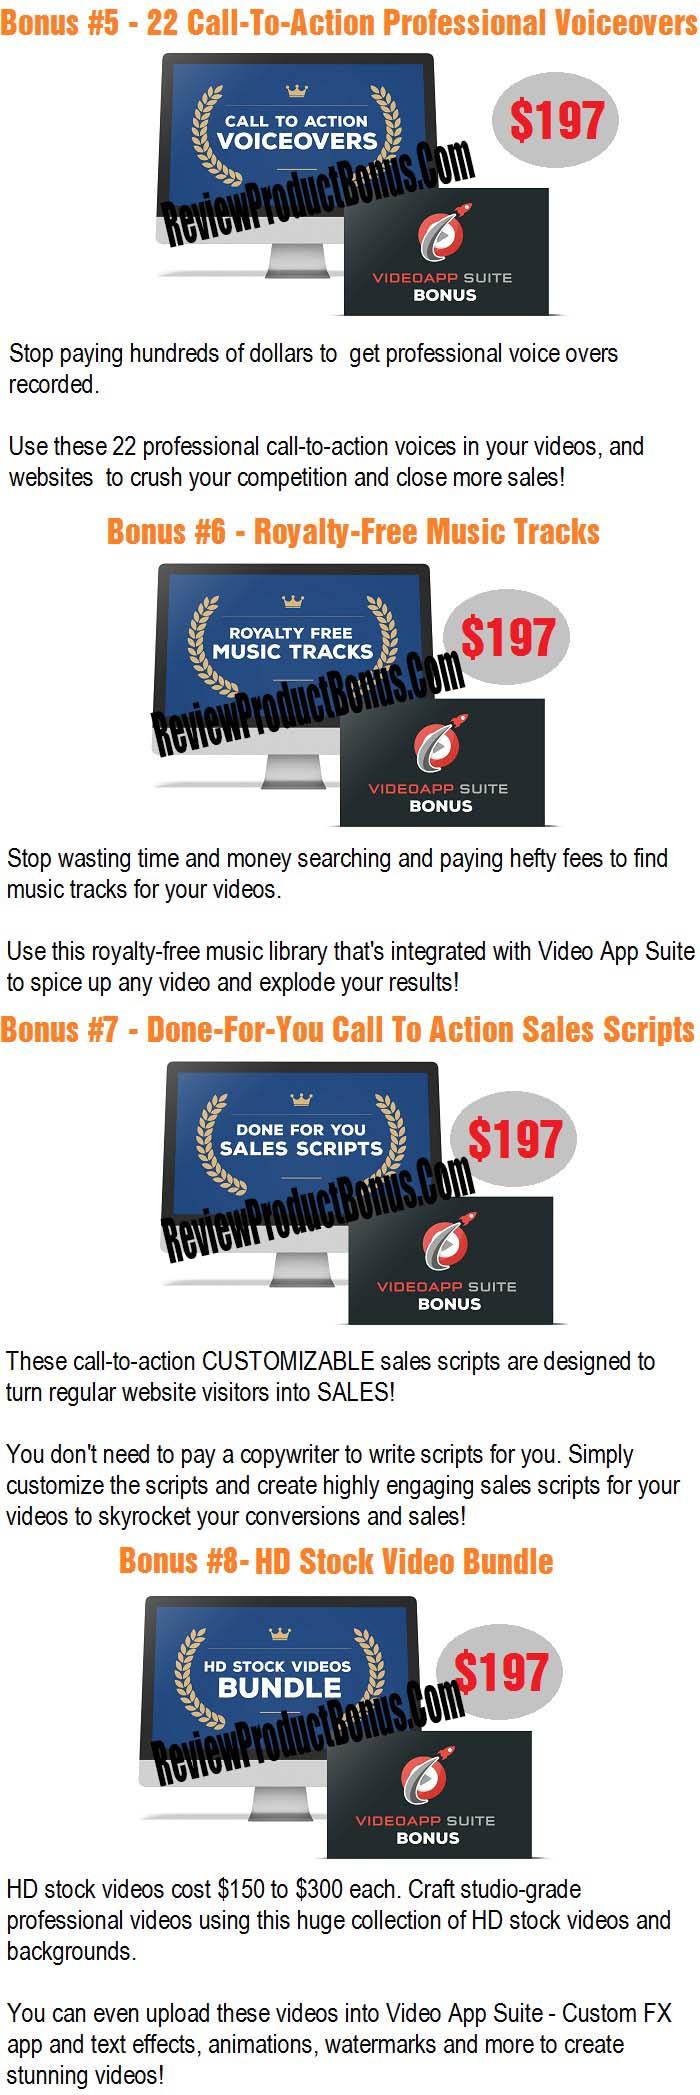 Video App Suite Bonuses